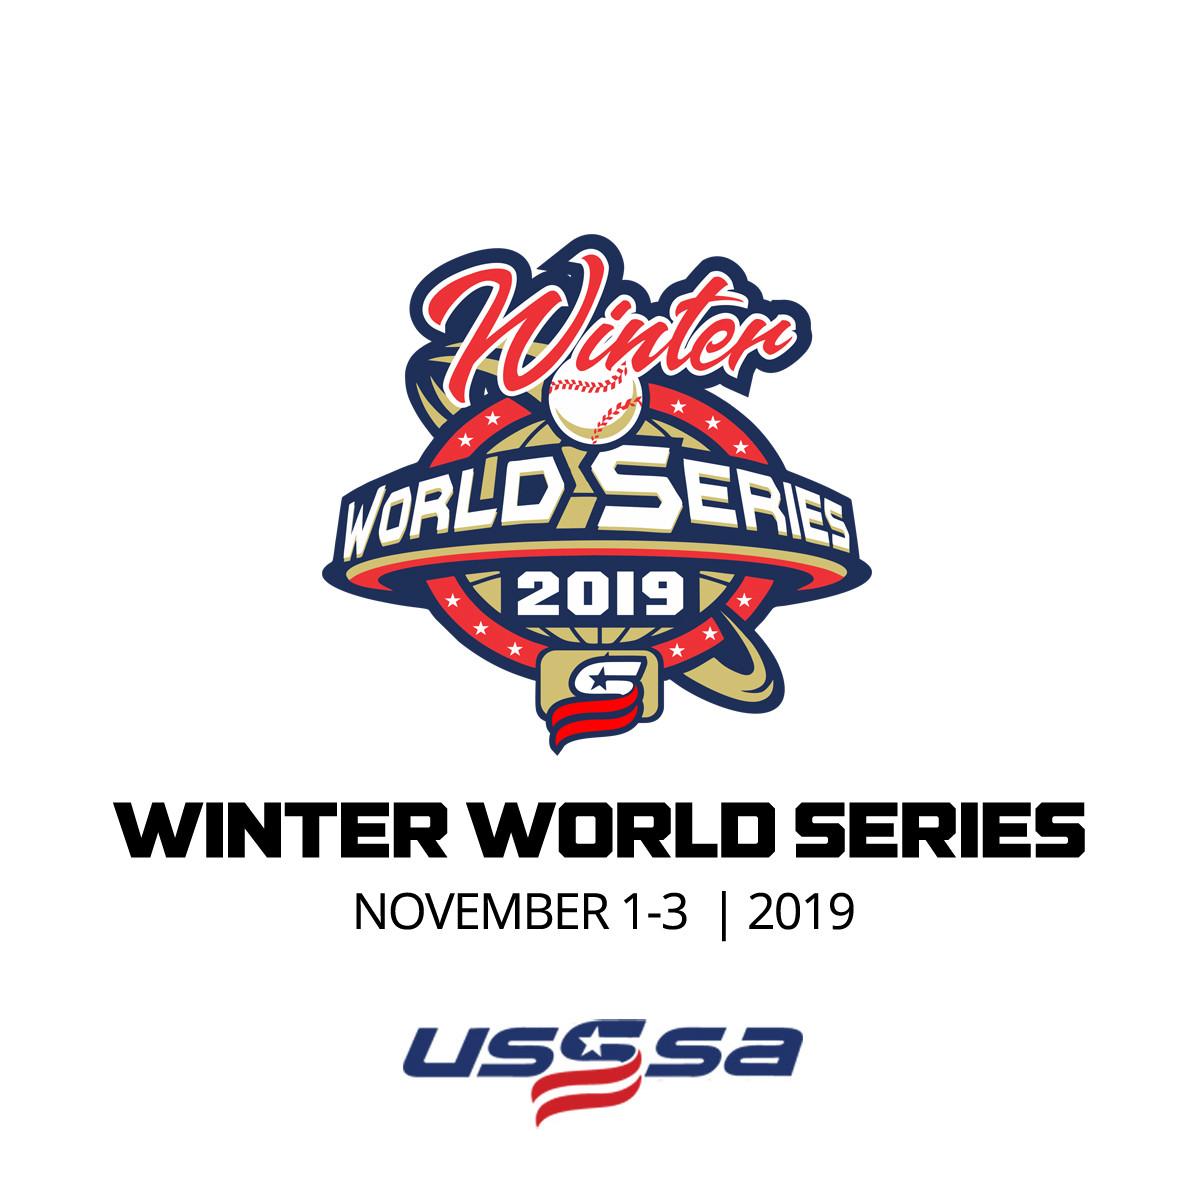 Winter National World Series